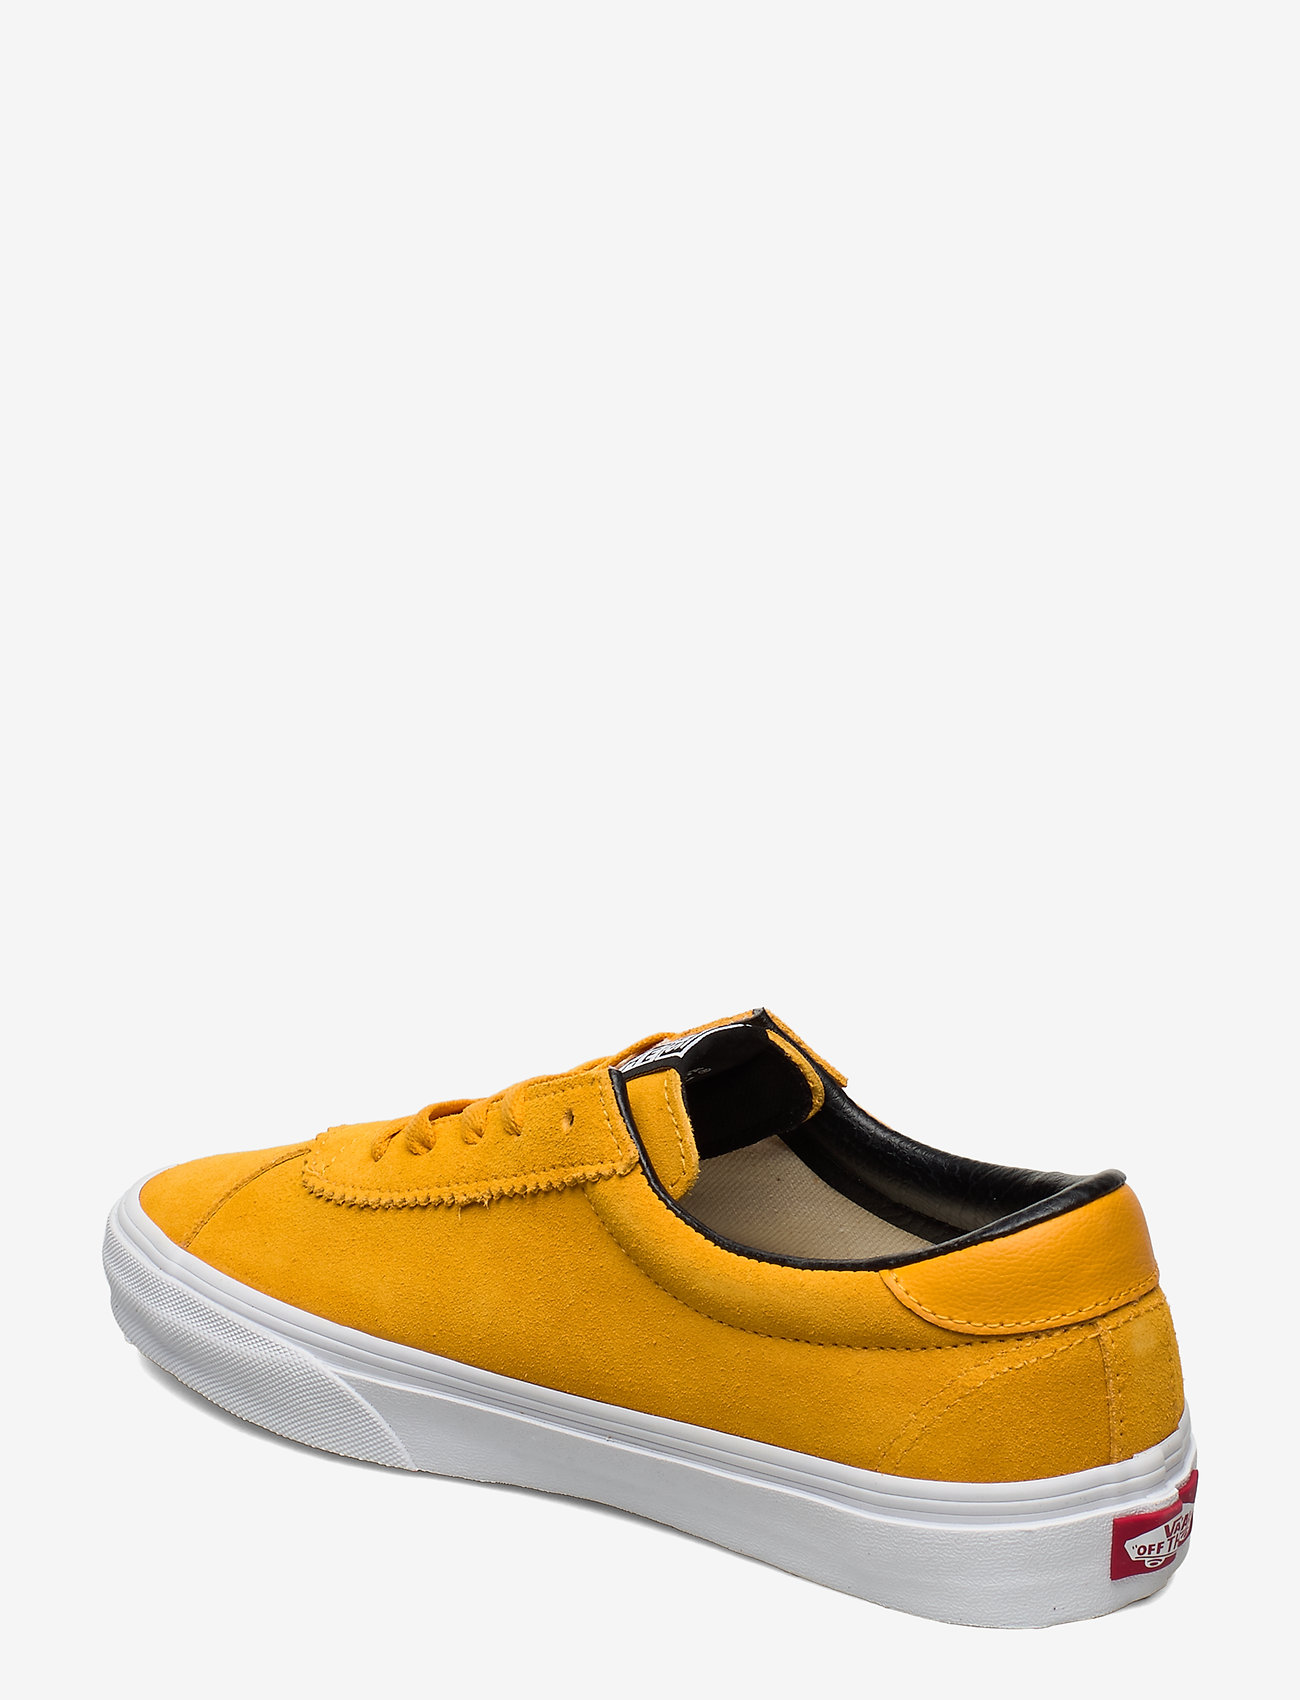 Ua Vans Sport (Cadmium Yellow/true White) - VANS